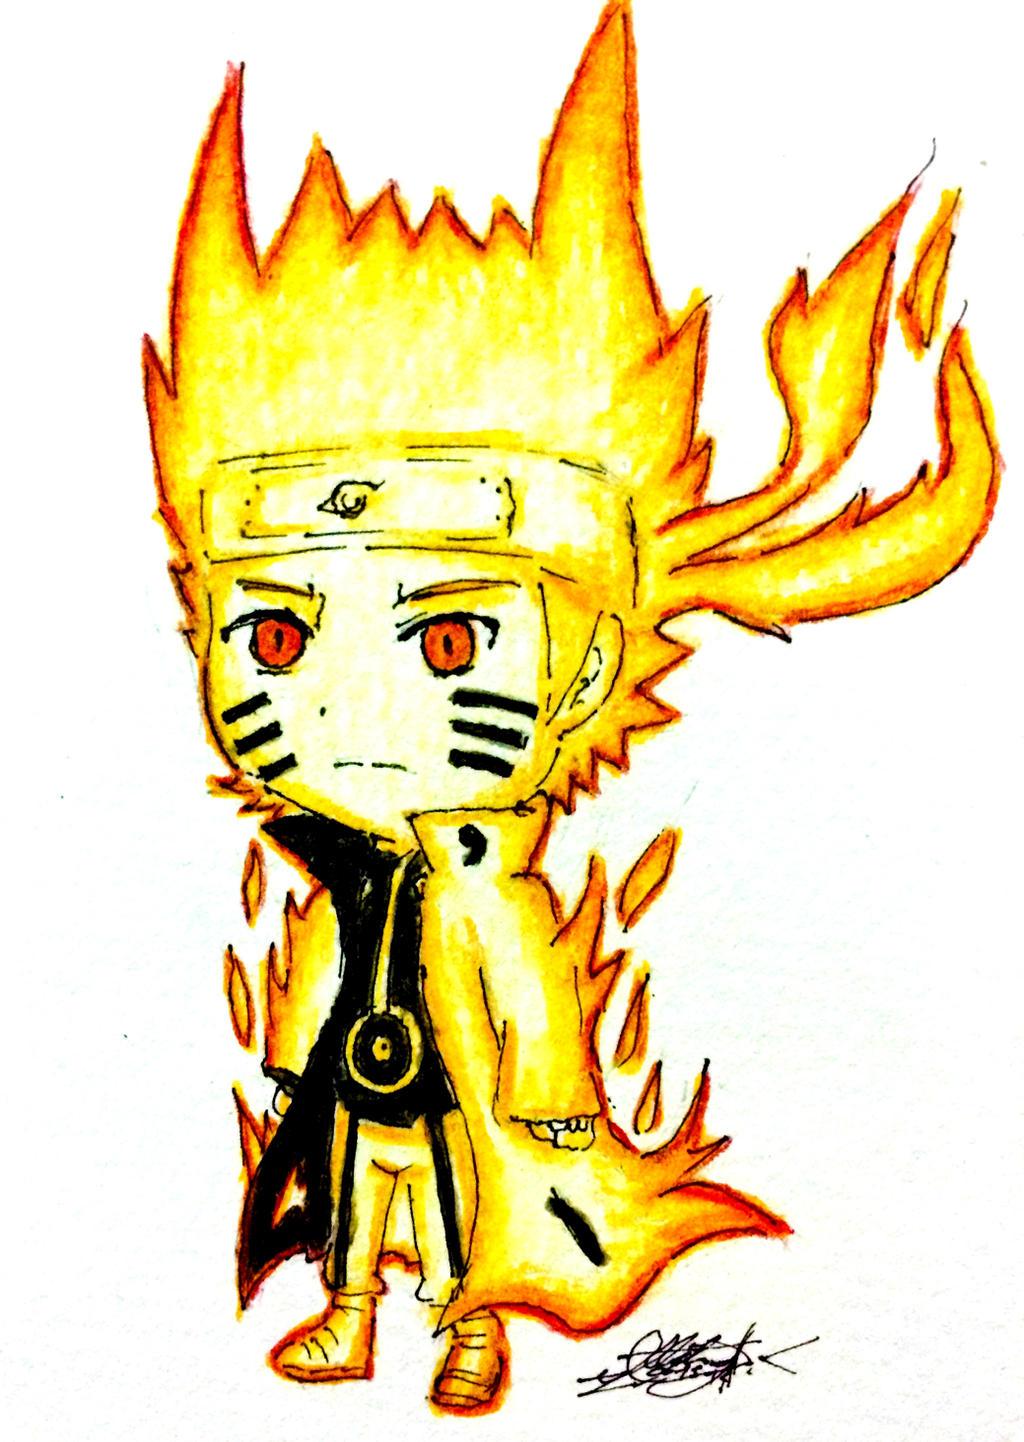 Anime Chibi Naruto Nine Tails – HD Wallpaper Gallery